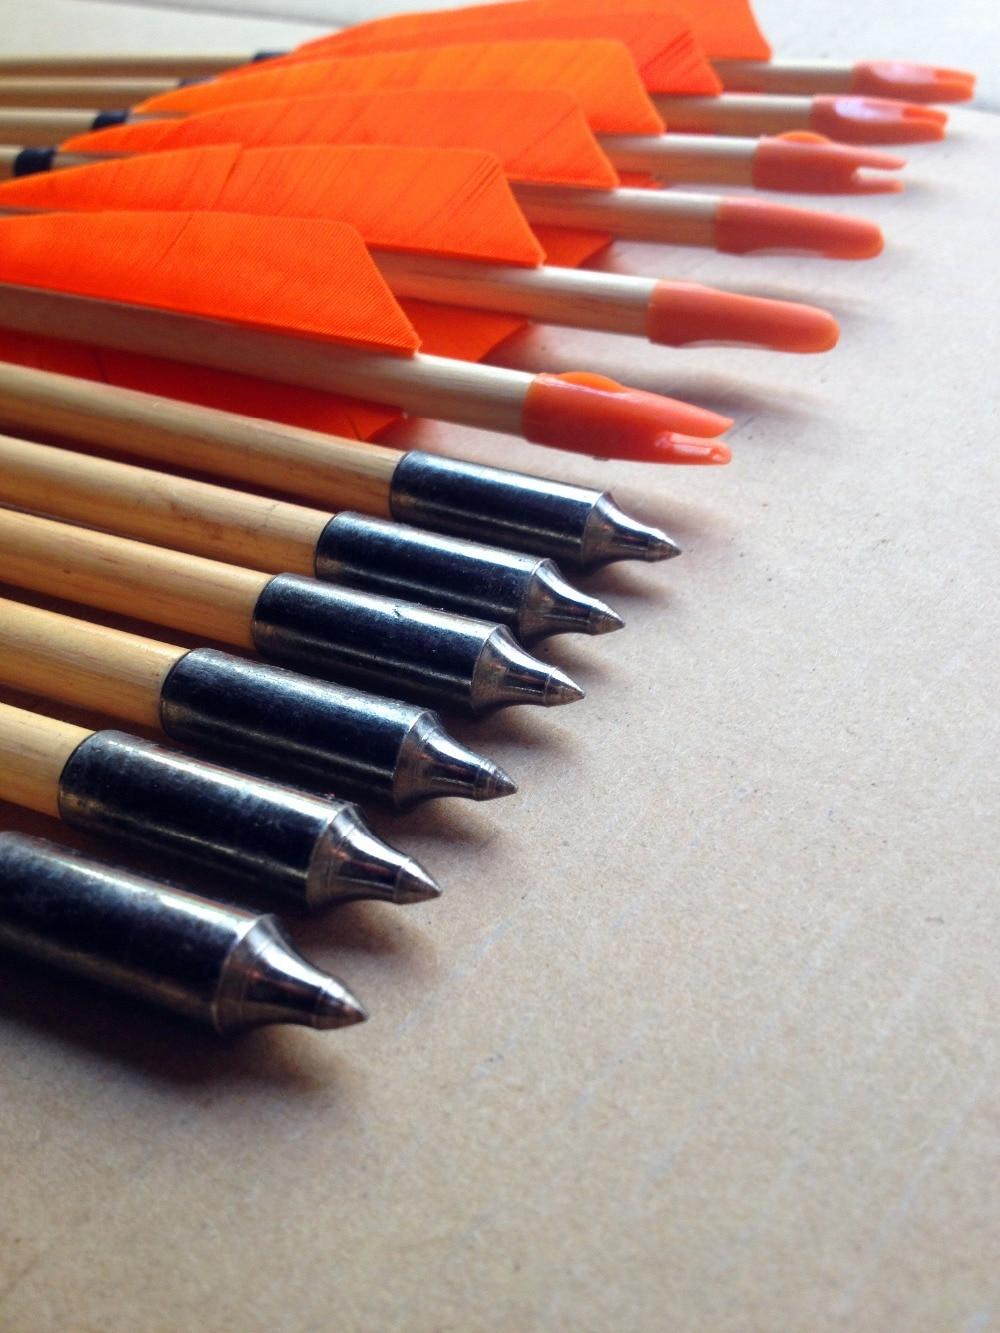 12 pcs tranditional wooden arrow turkey feather wood arrows archery bow hunting